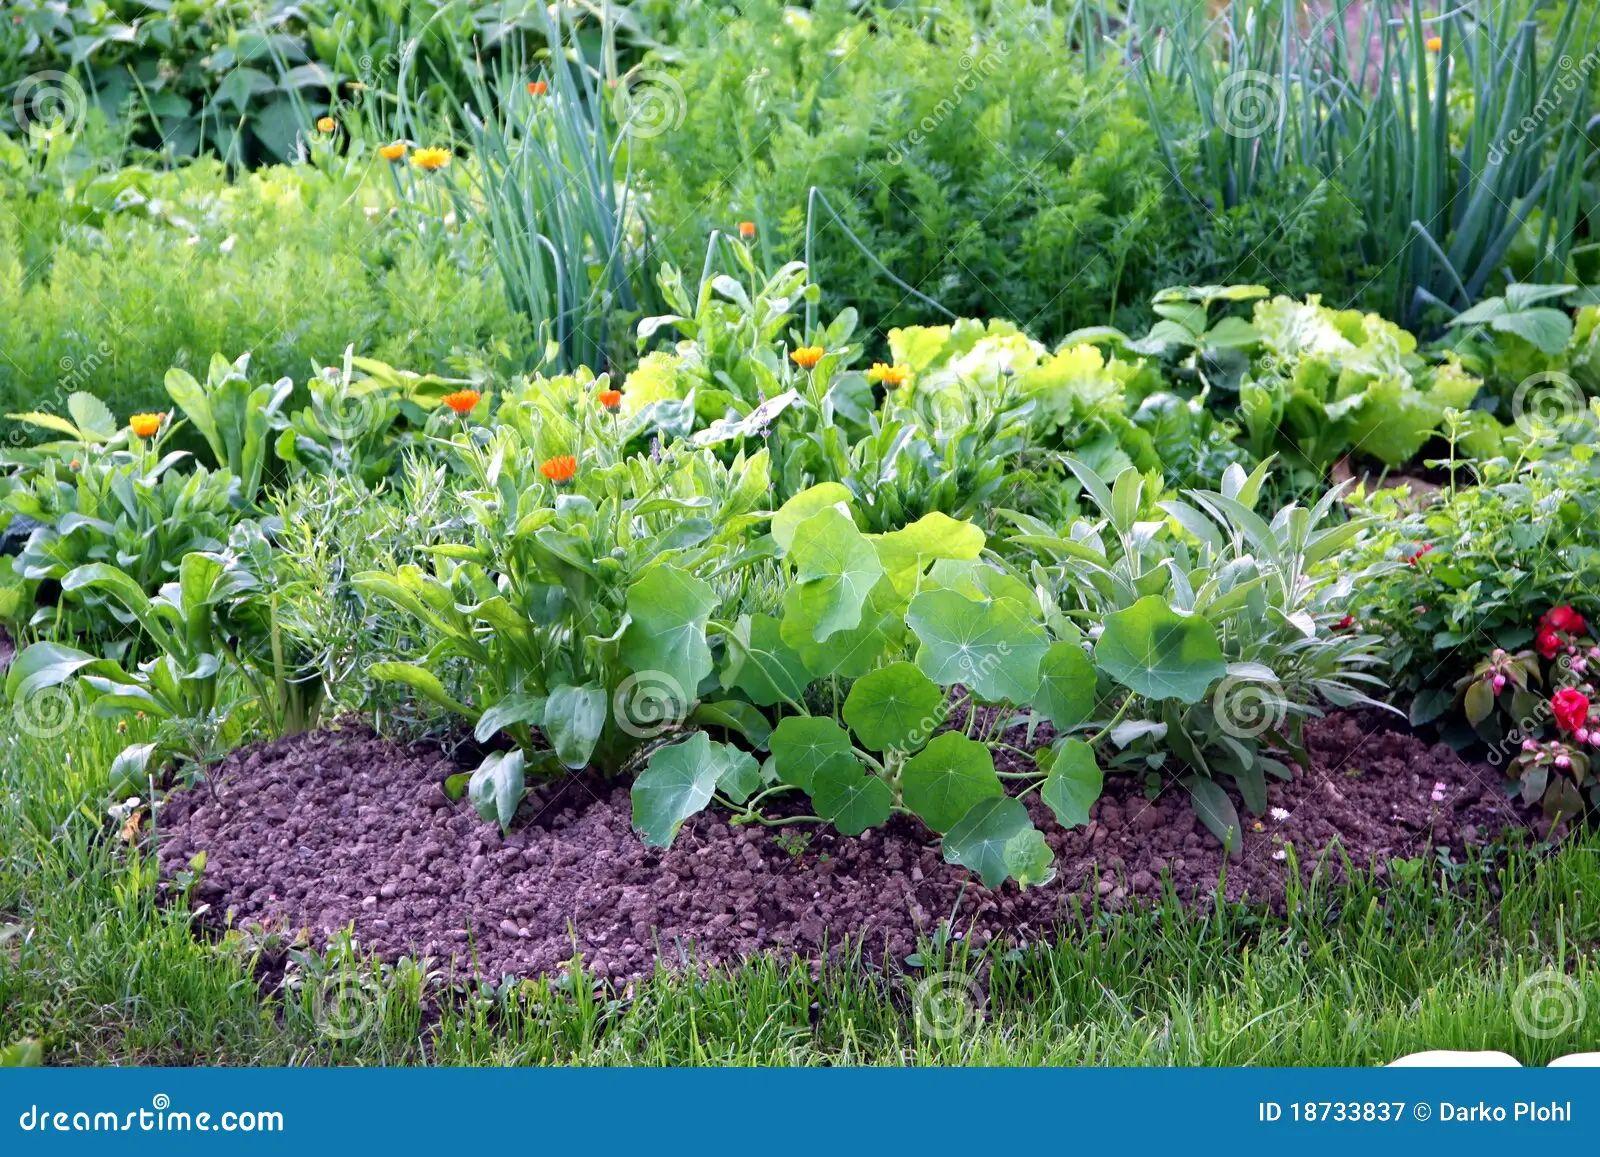 Bed garden mix organic plants vegetable